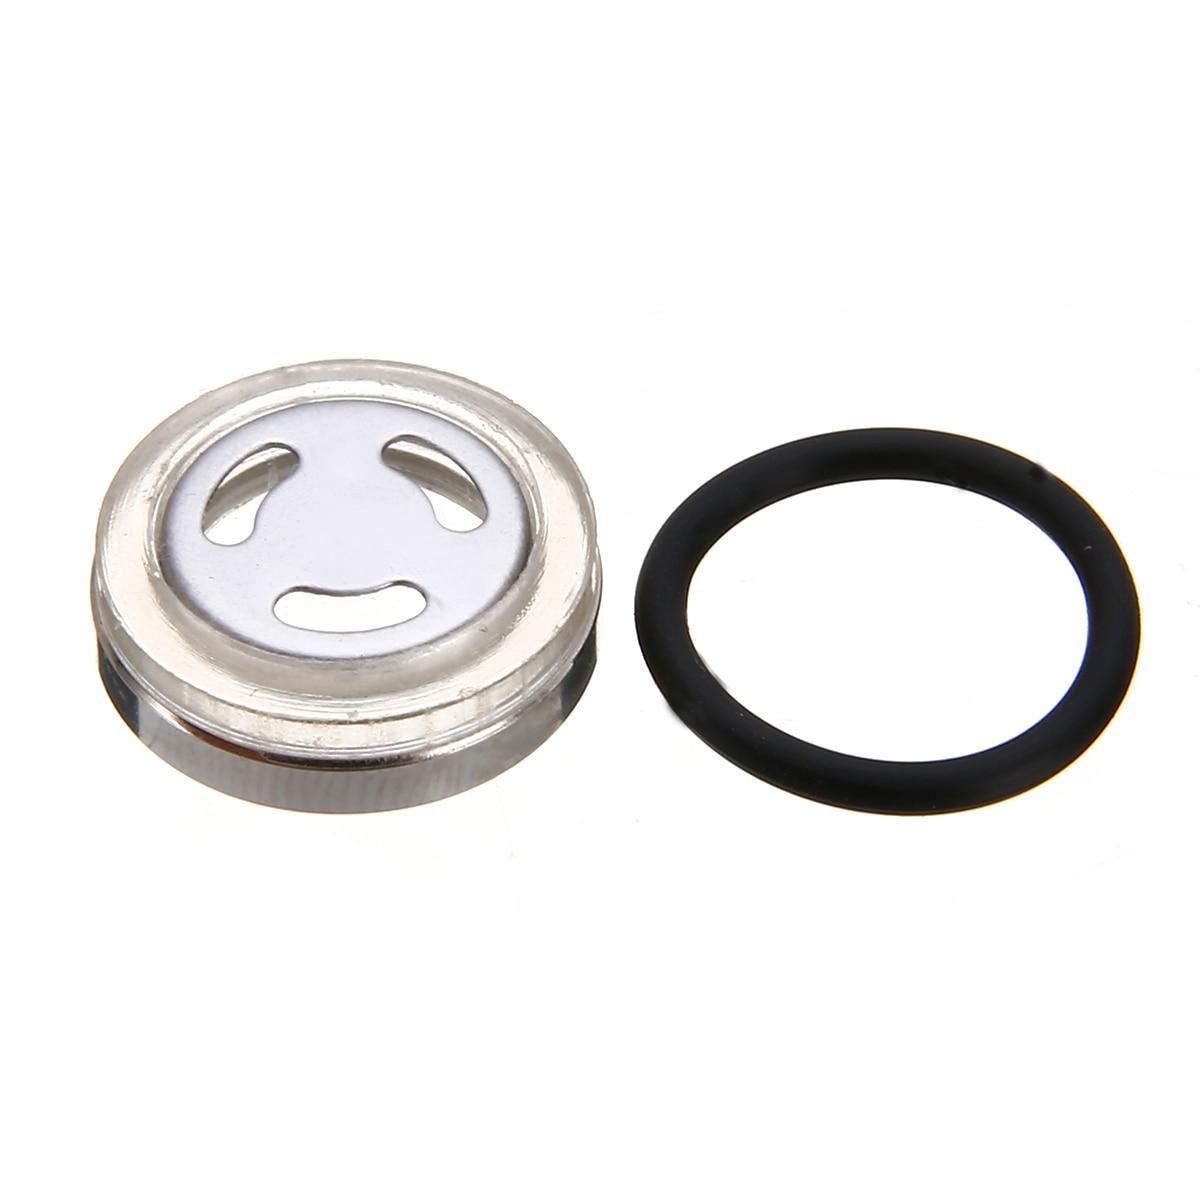 For Honda Suzuki Kawasaki 1pc 18mm Universal Motorcycle Brake Master Cylinder Reservoir Sight Glass Lens + Gasket Mayitr